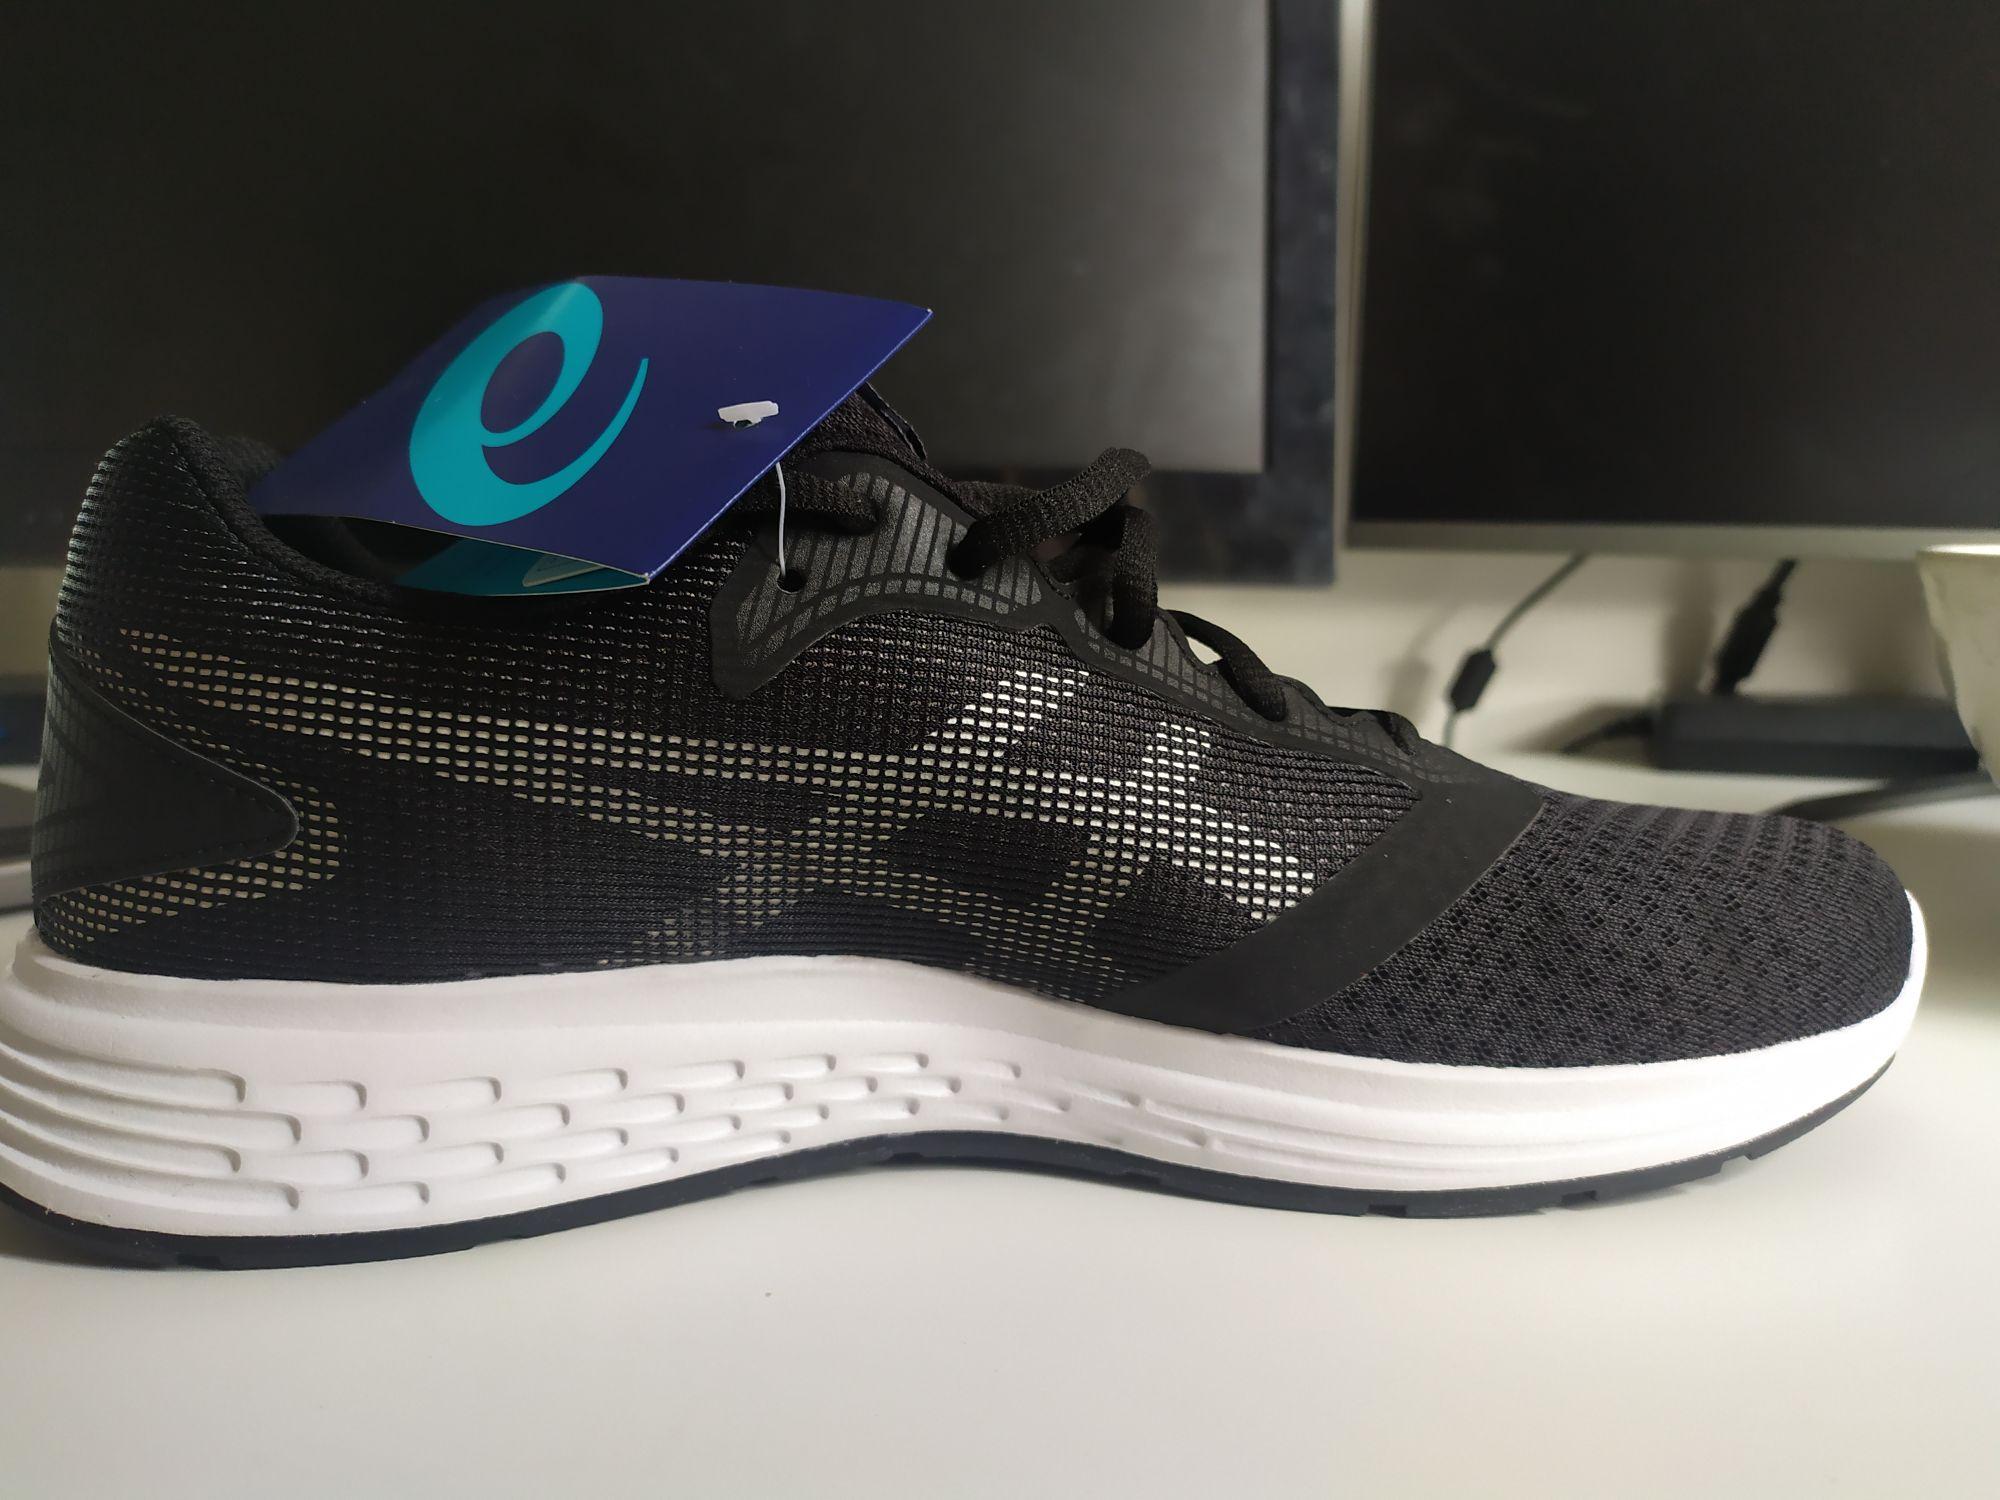 Chaussures de running Asics Patriot 10 (Diverses tailles) - Corbeil-Essonnes (91)